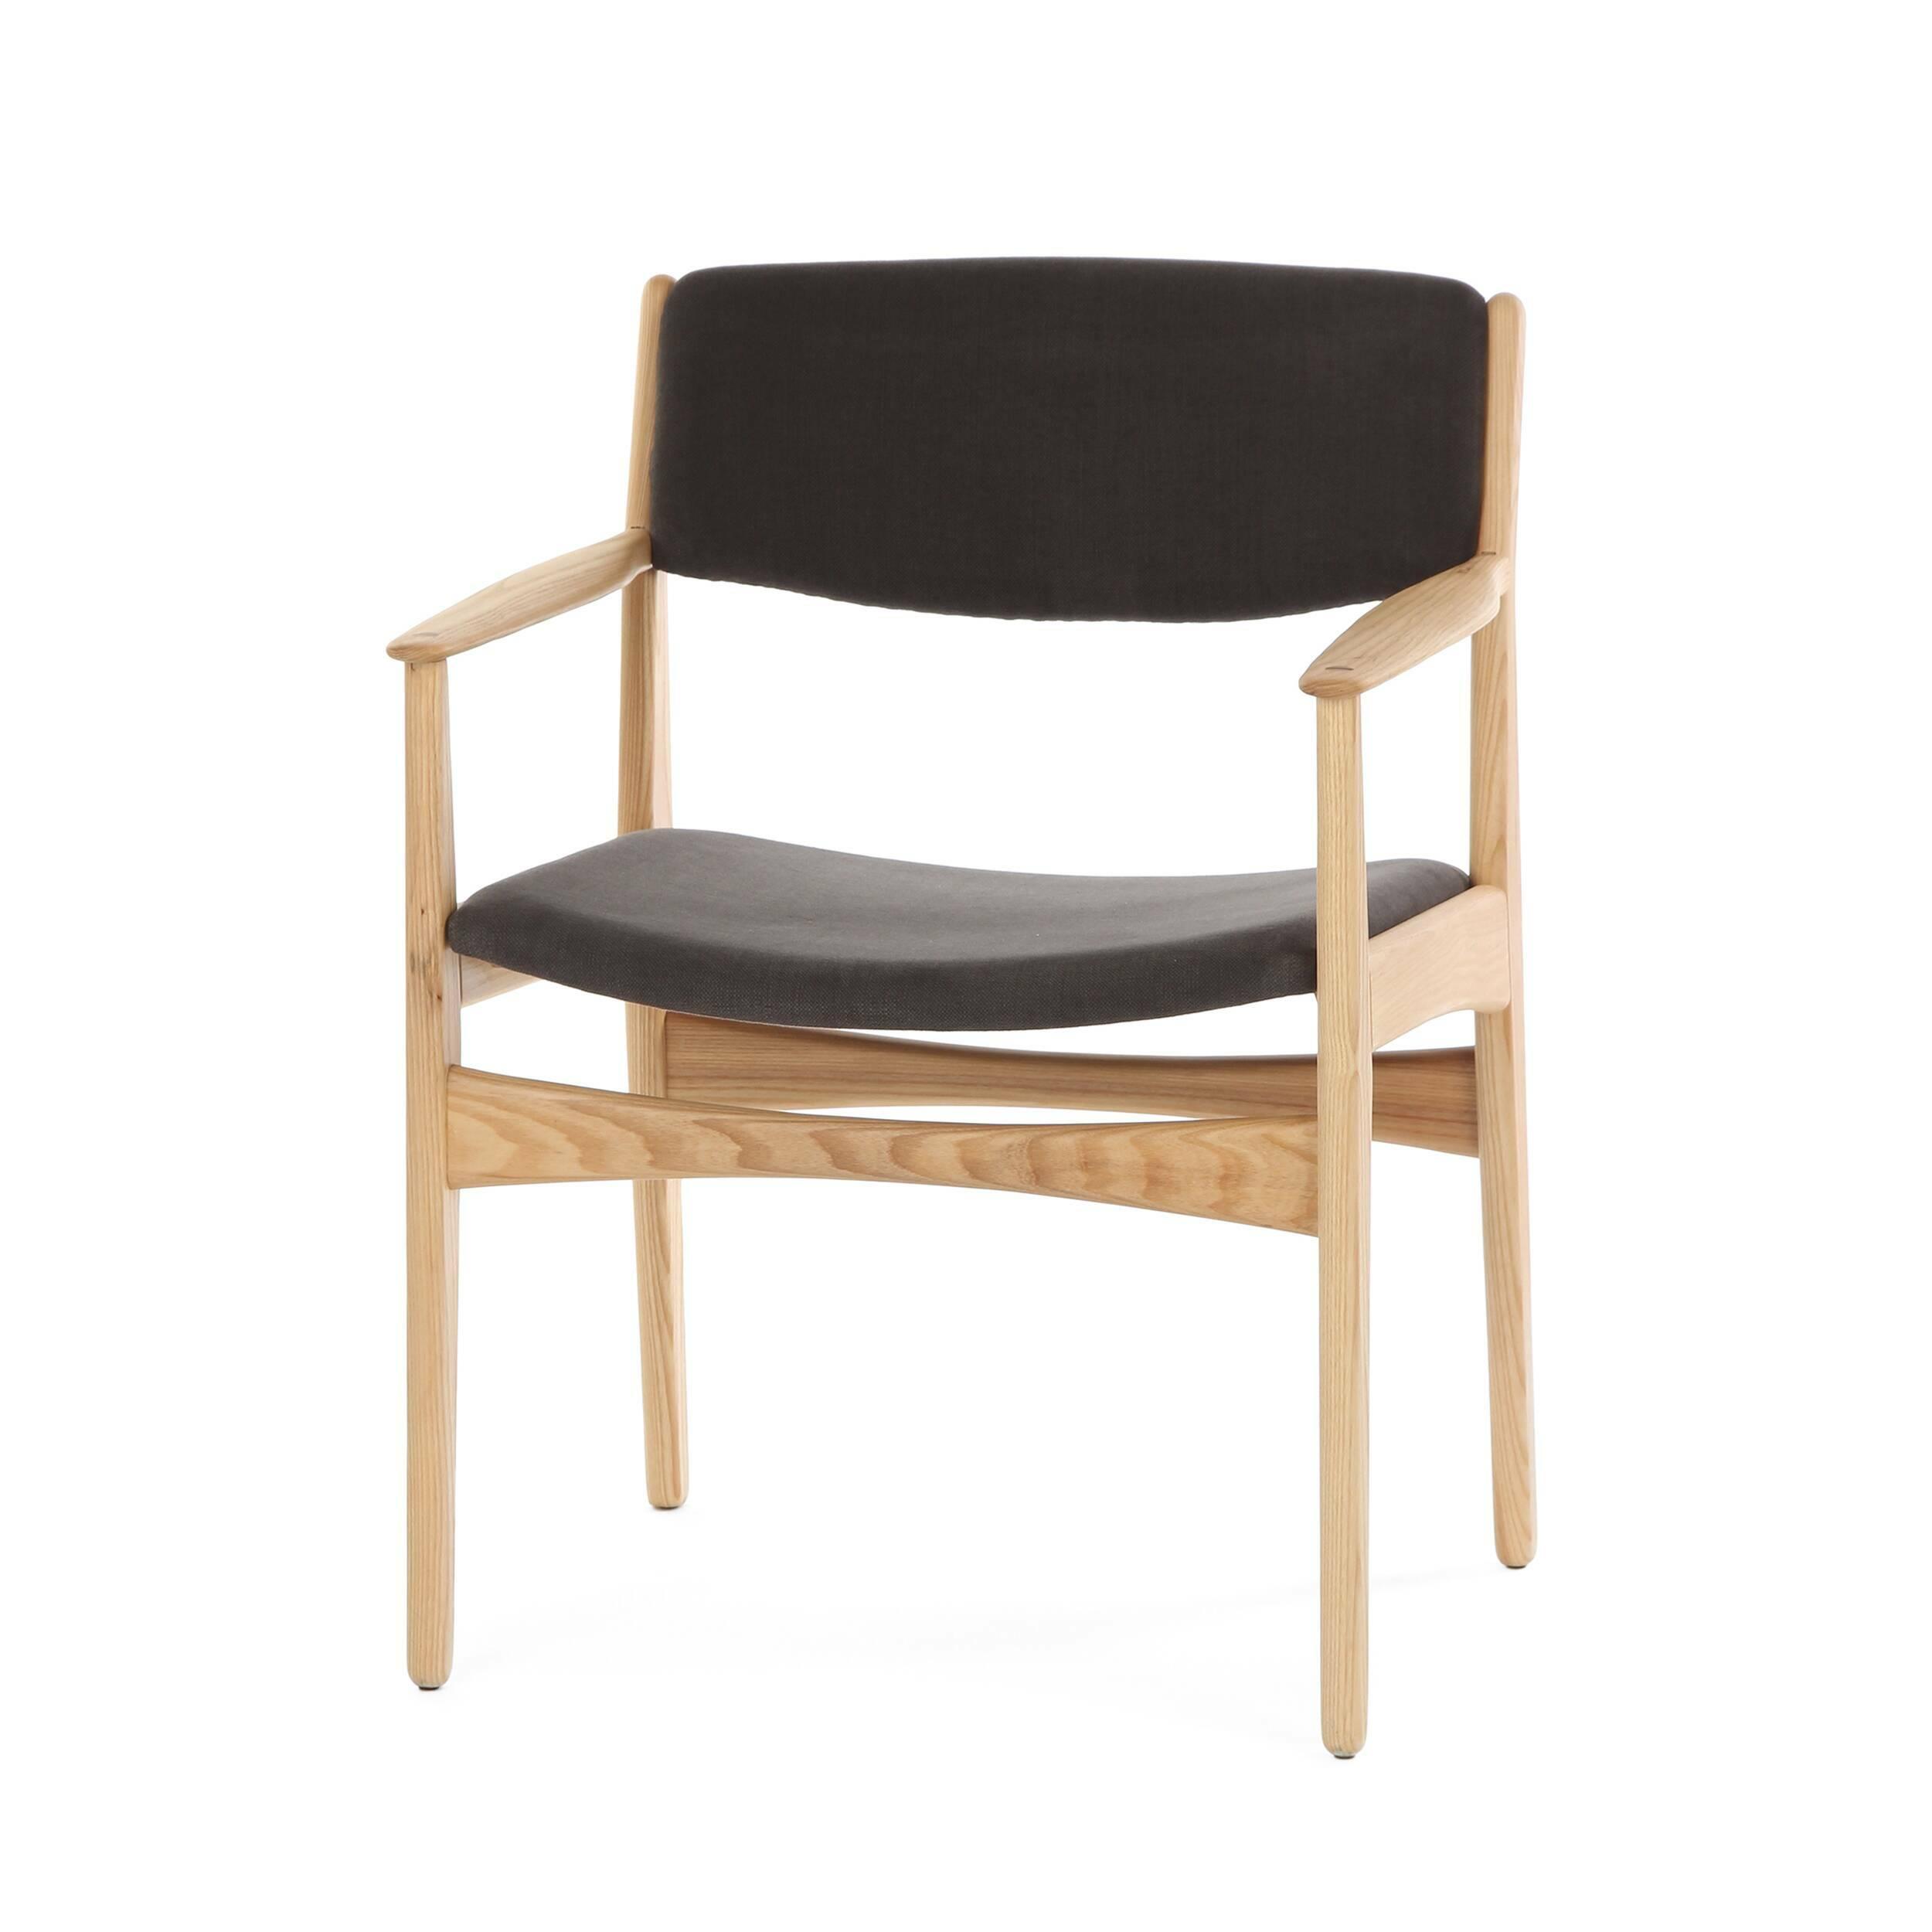 Стул Danish Chair gramercy стул с подлокотниками louis arm chair